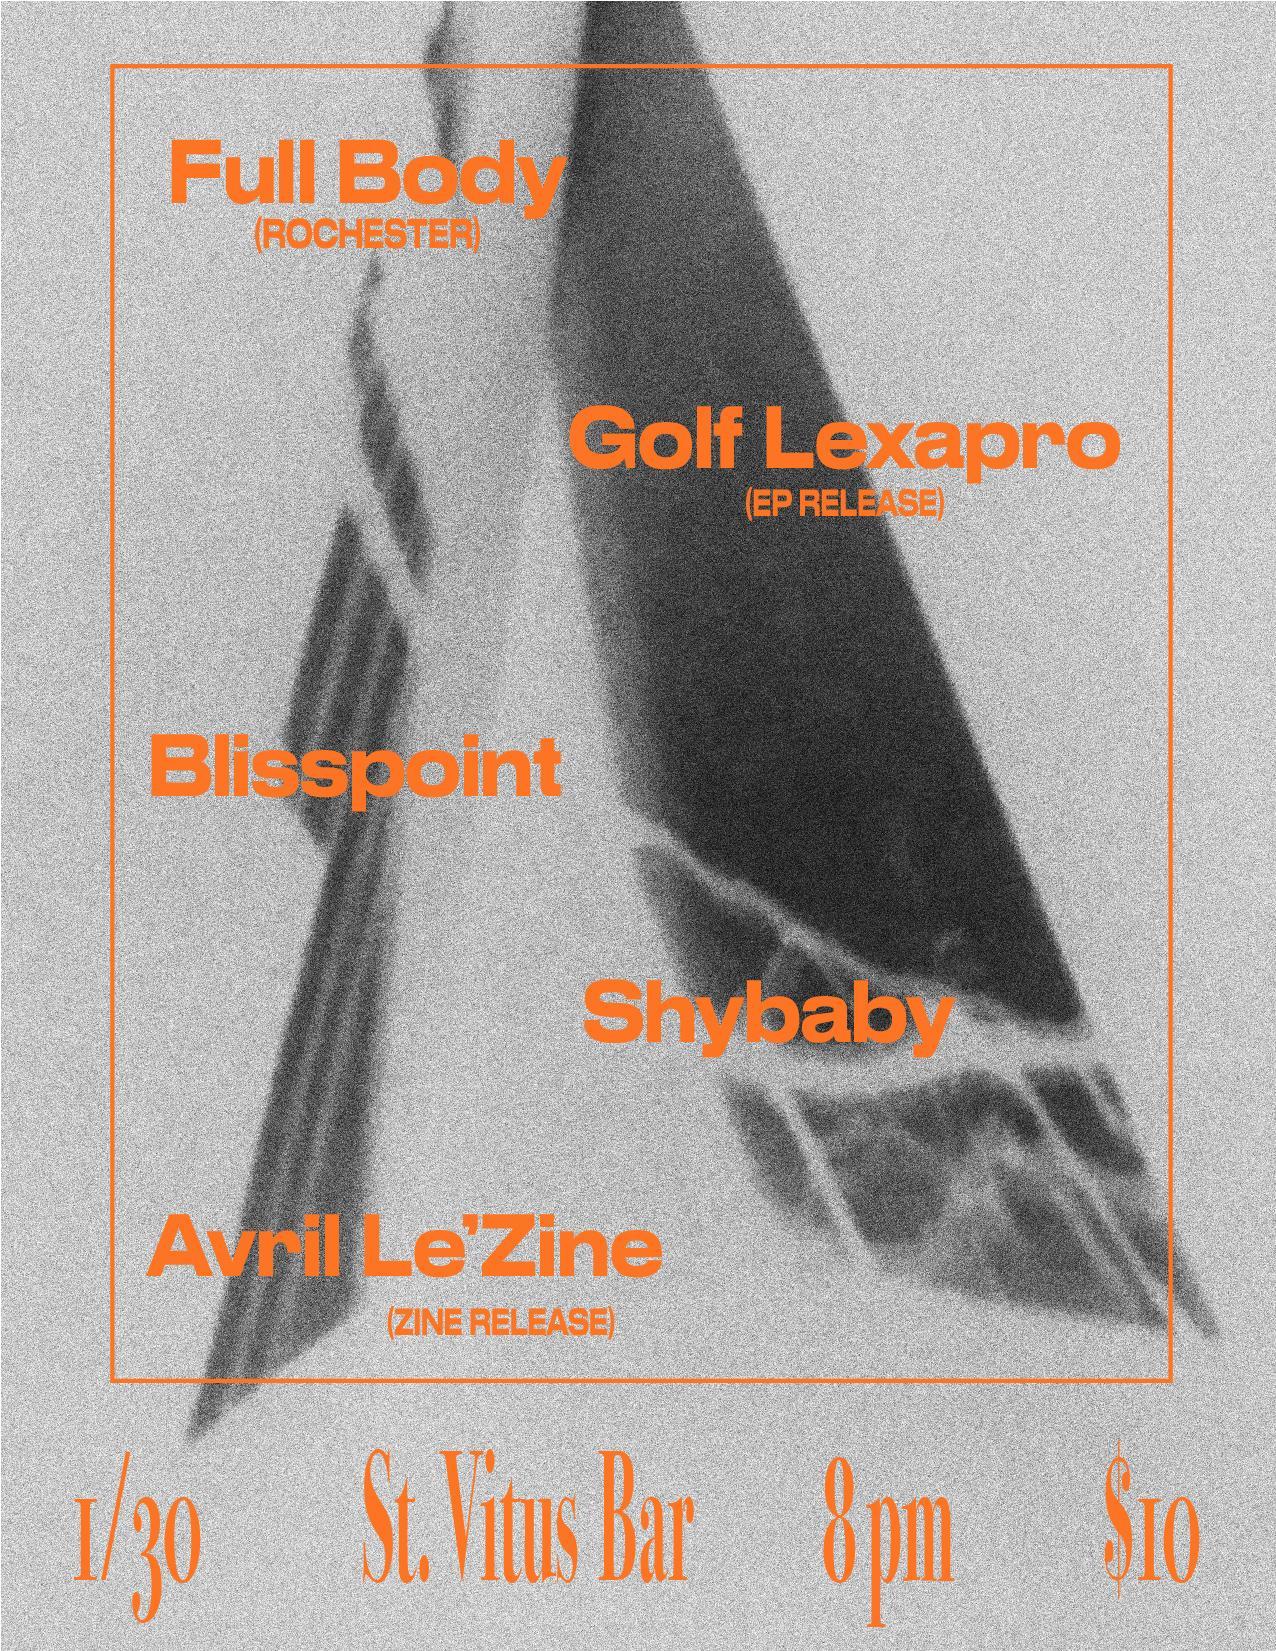 Full Body, Golf Lexapro, Blisspoint, Shybaby, Avril Le'Zine (zine release)